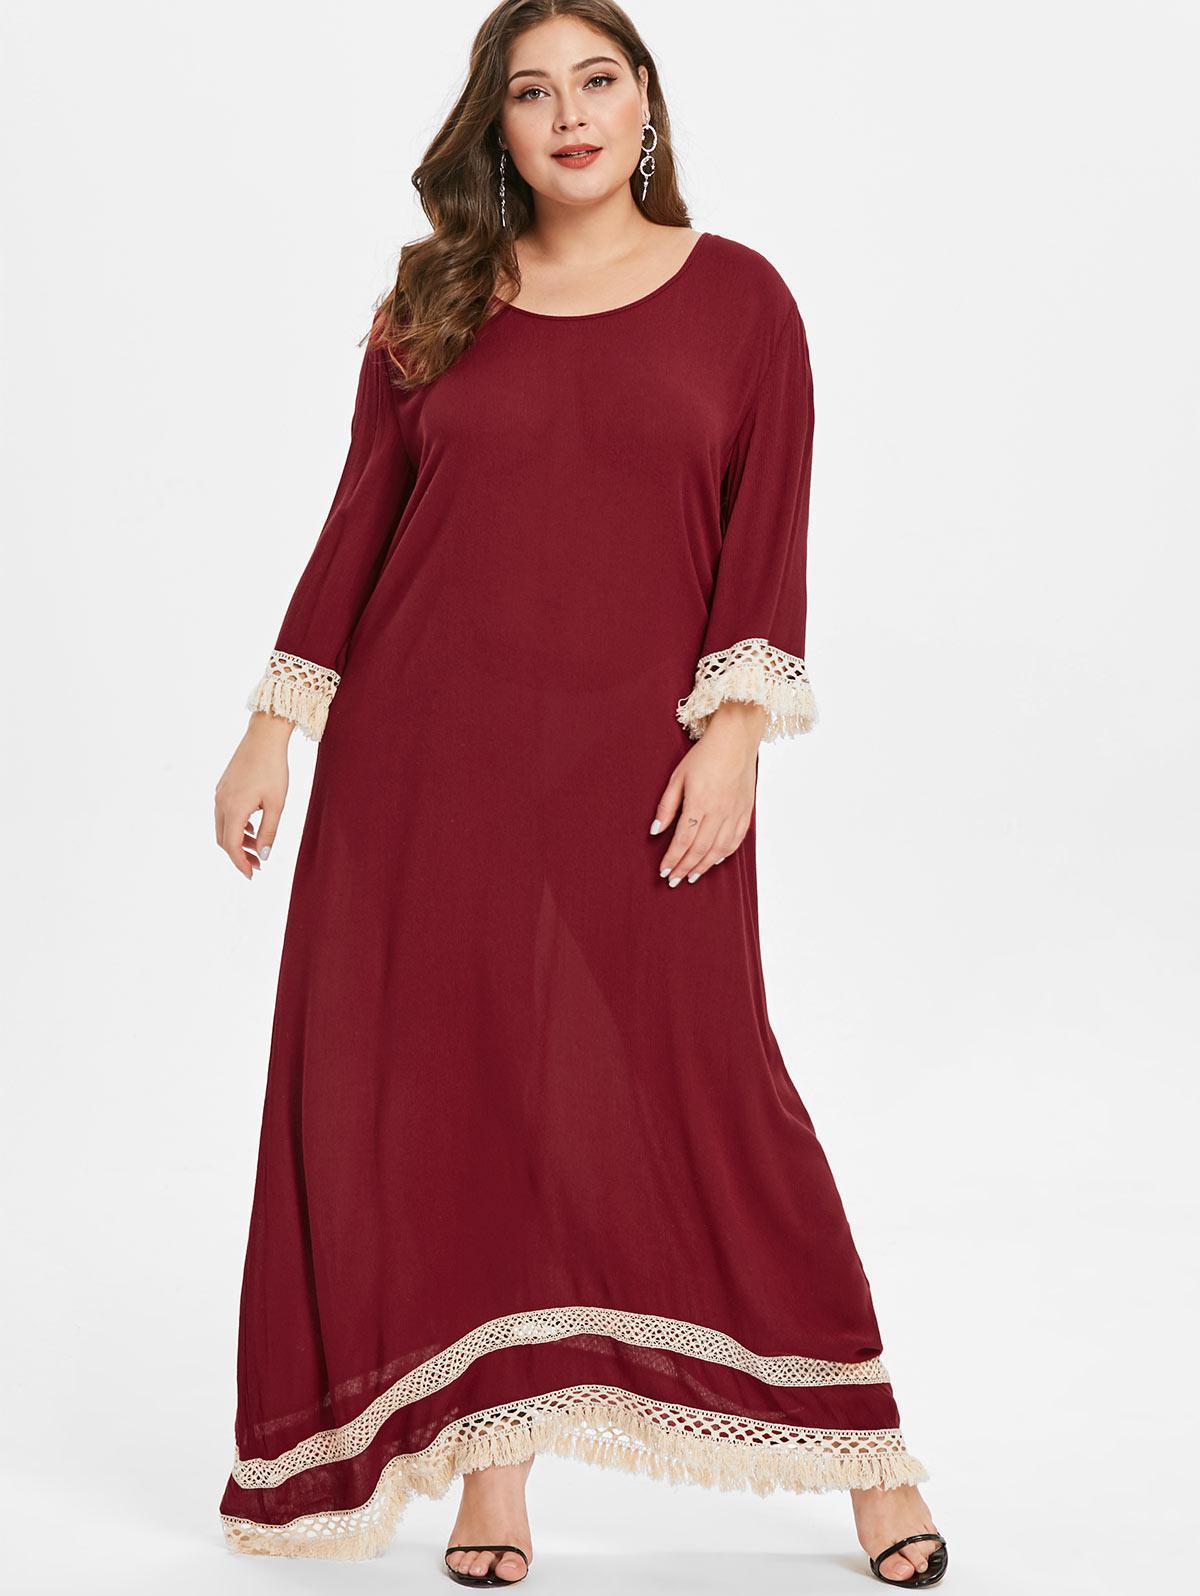 Floor Length Plus Size Fringed Trim Dress